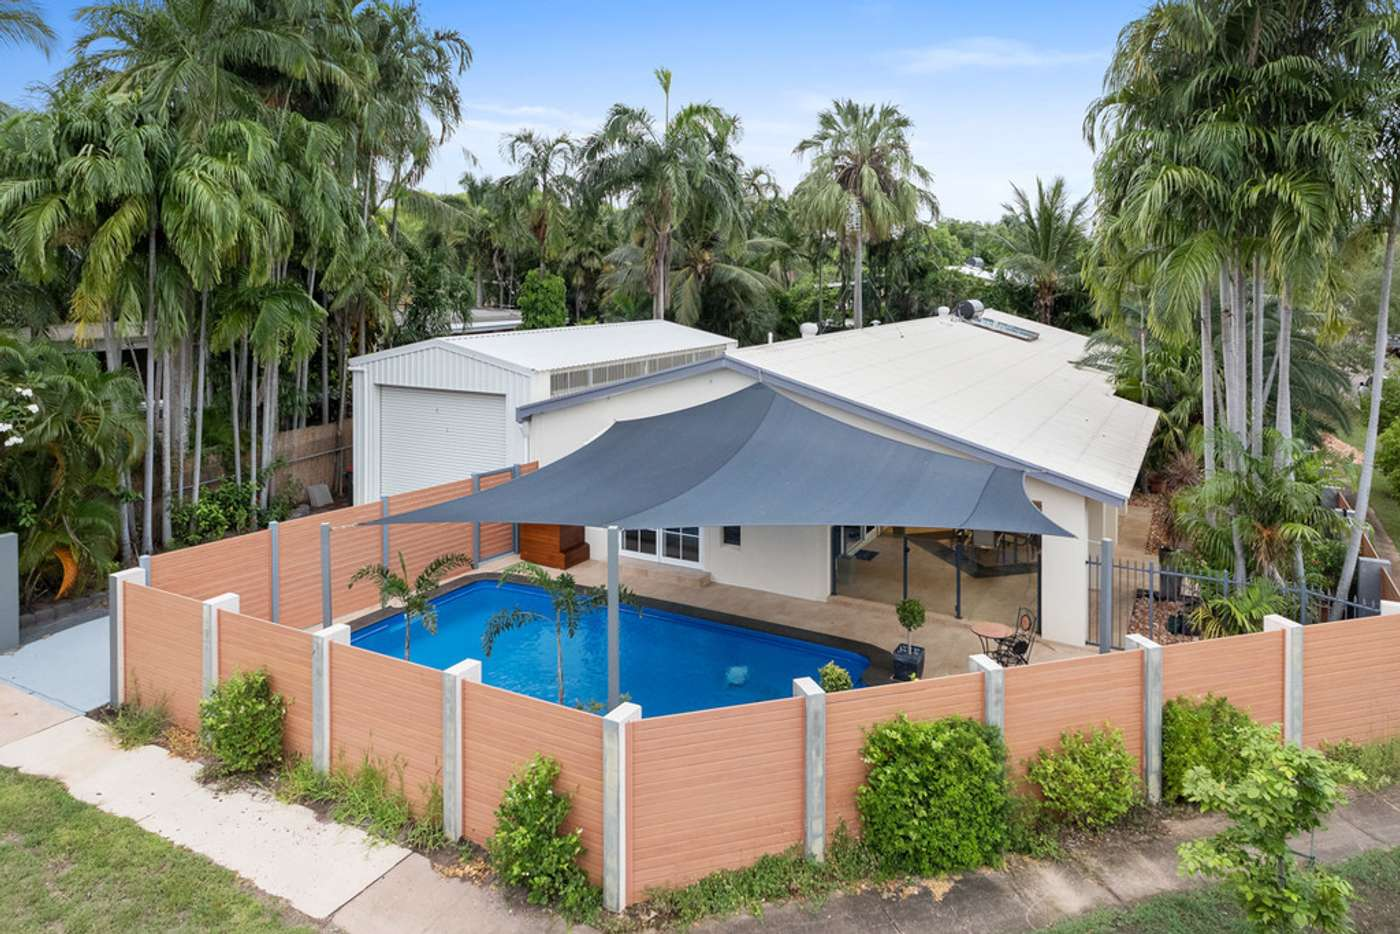 Main view of Homely house listing, 46 Marrakai Street, Tiwi NT 810